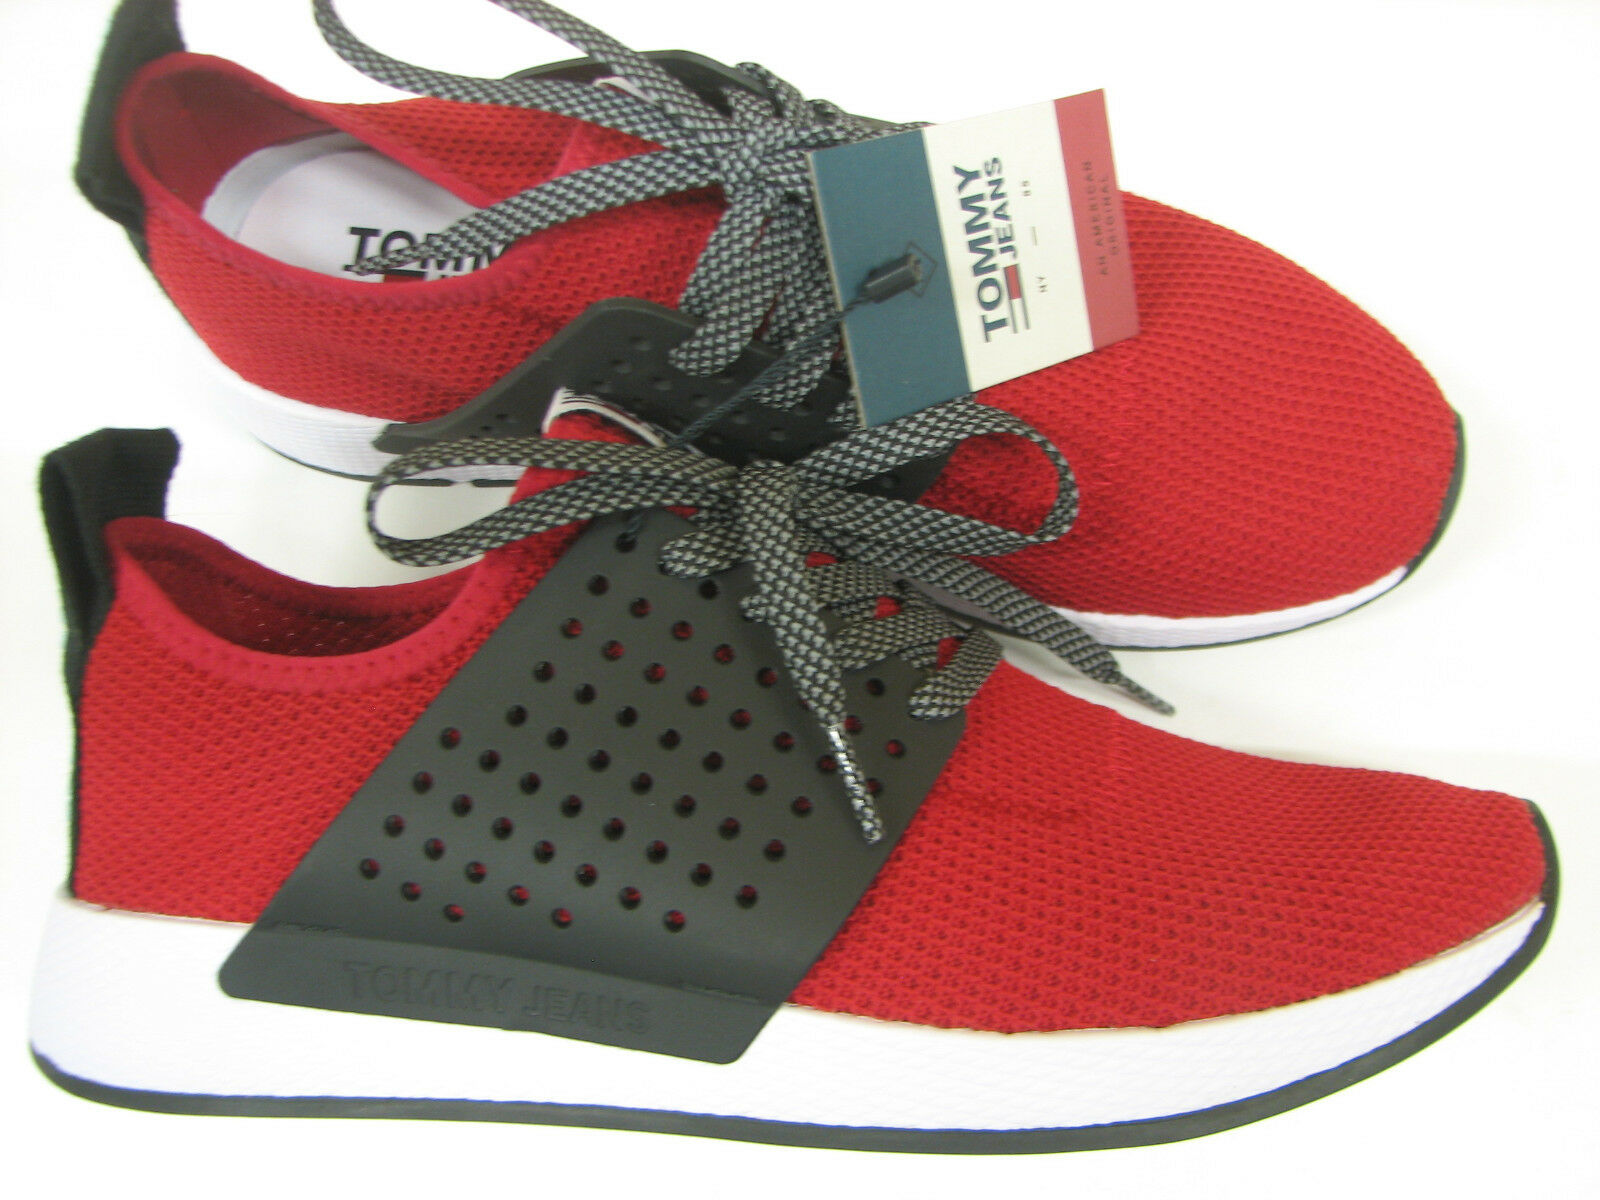 Tommy Hilfiger Sneaker Schnürer Knit Sneaker rot tango Red Runner Gr. 42 2018